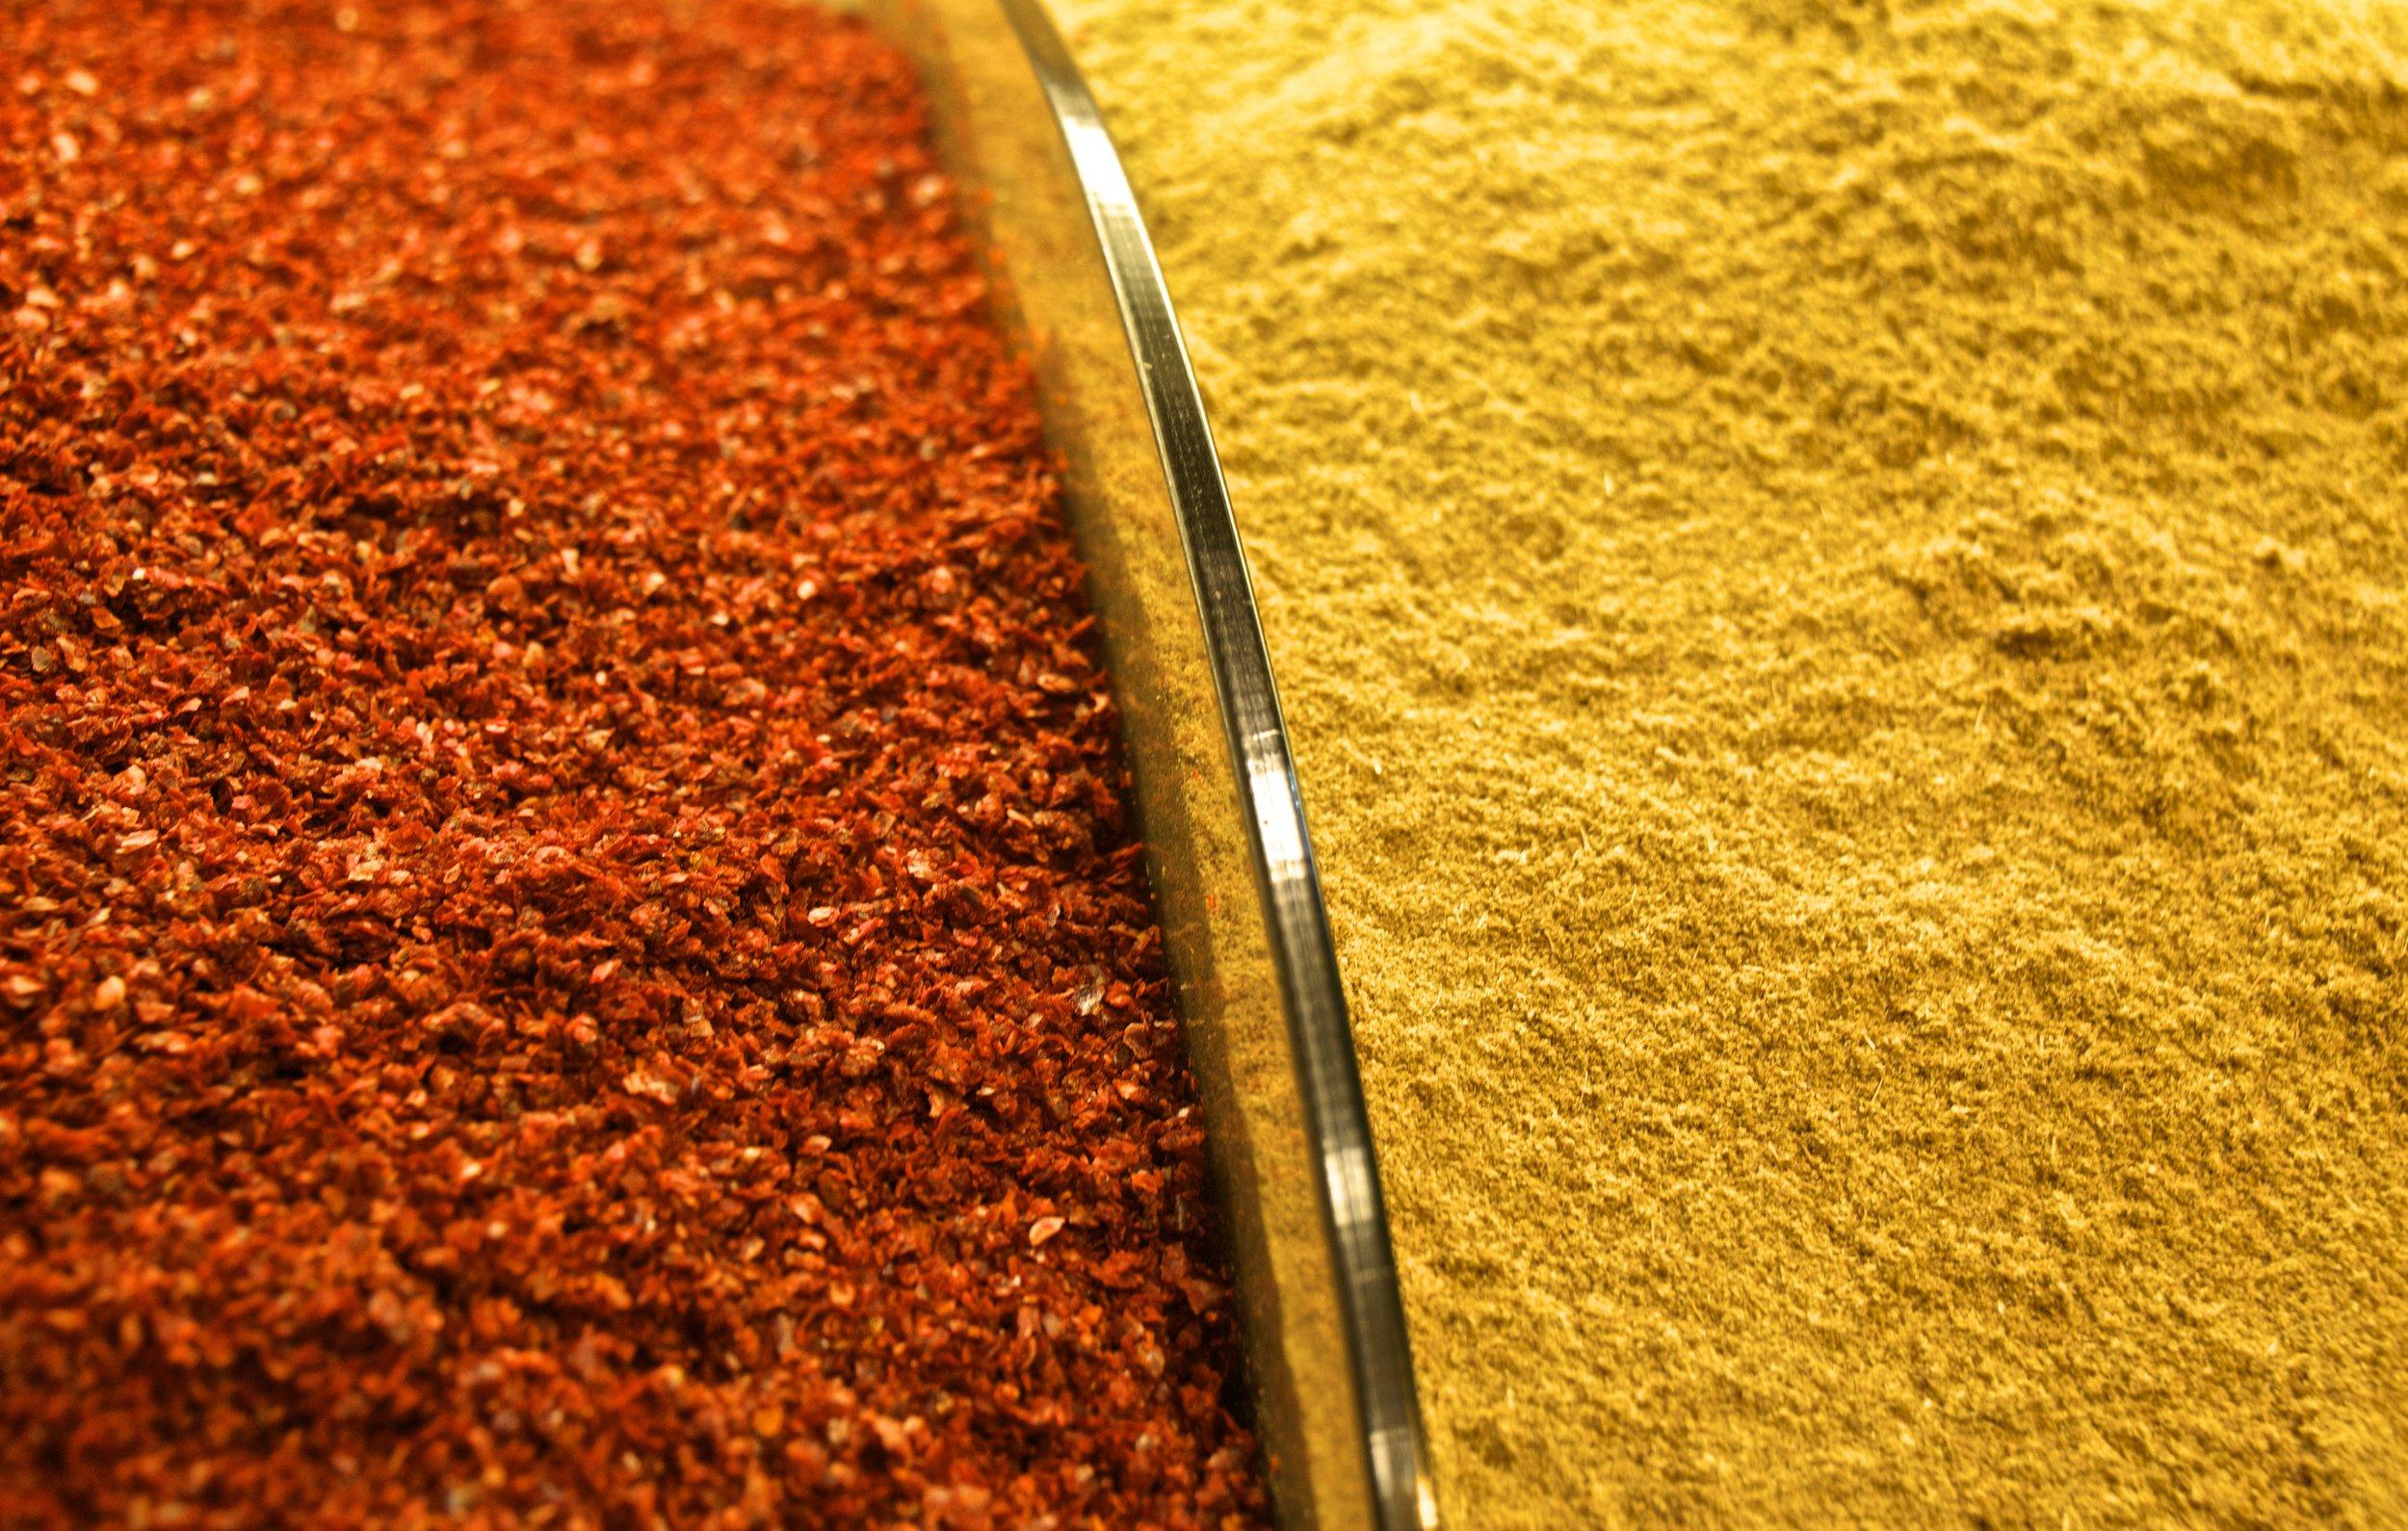 spice bazaar istanbul turkey 9.jpg